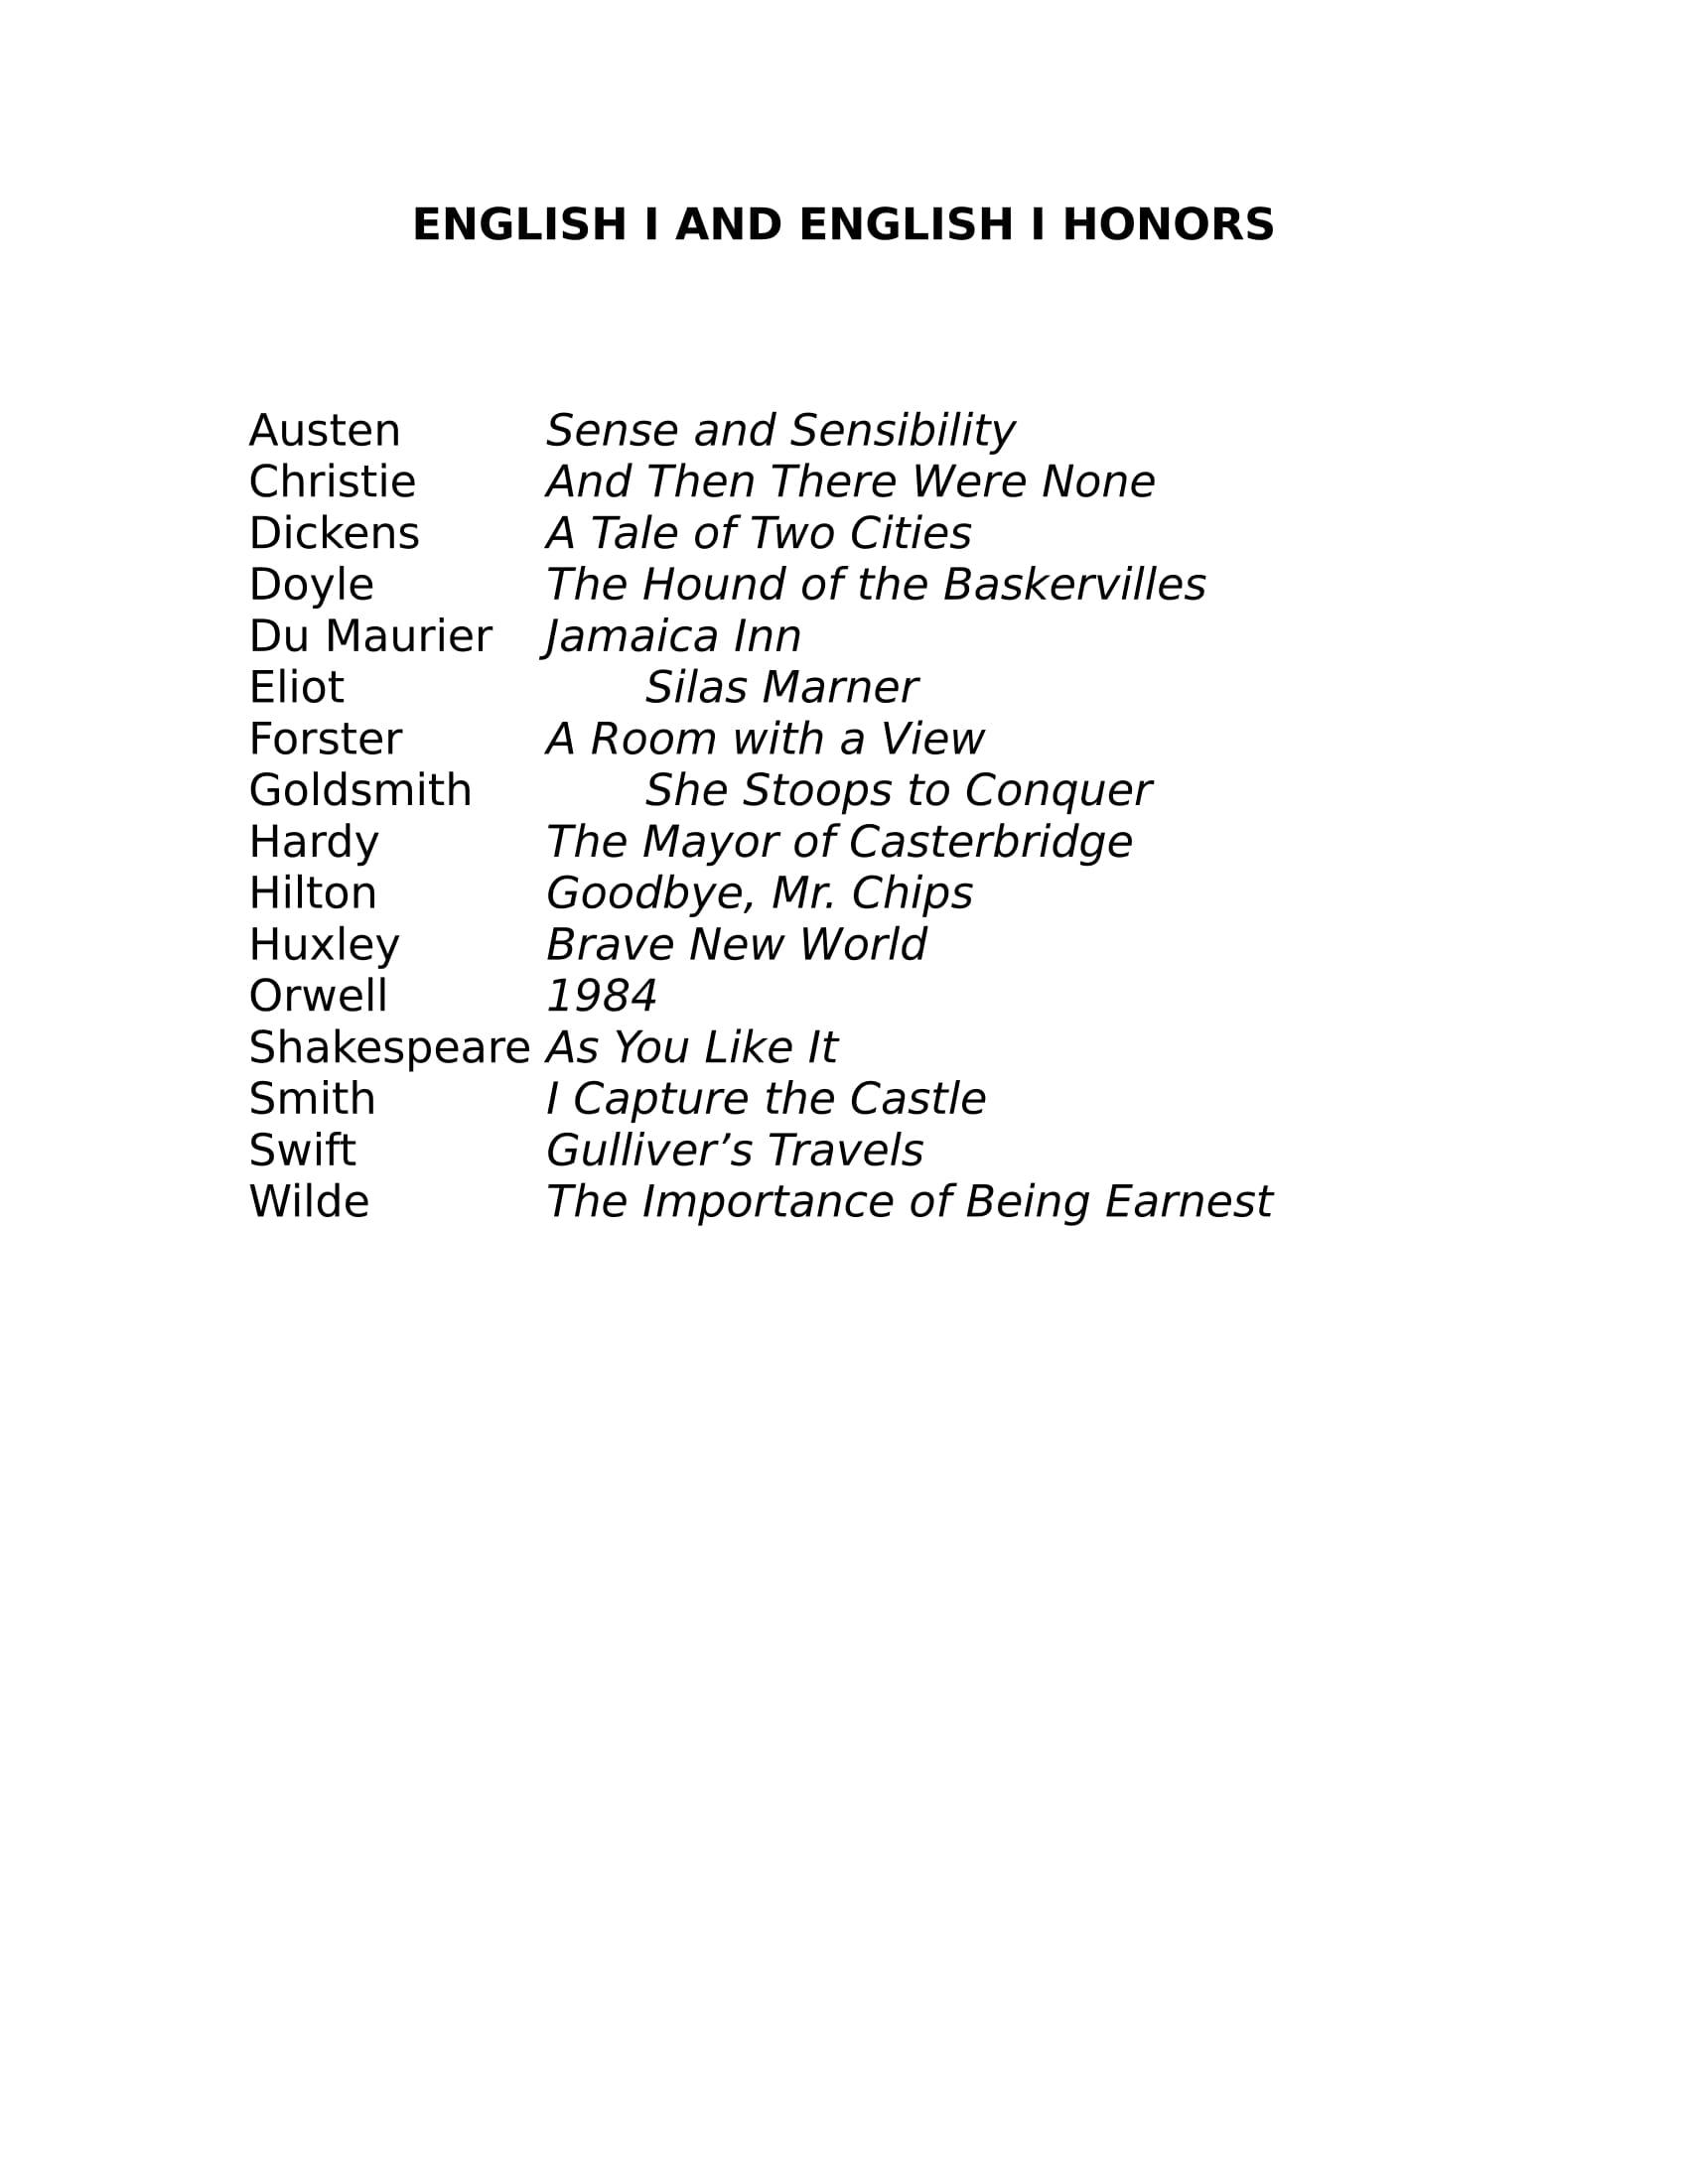 summer reading list example